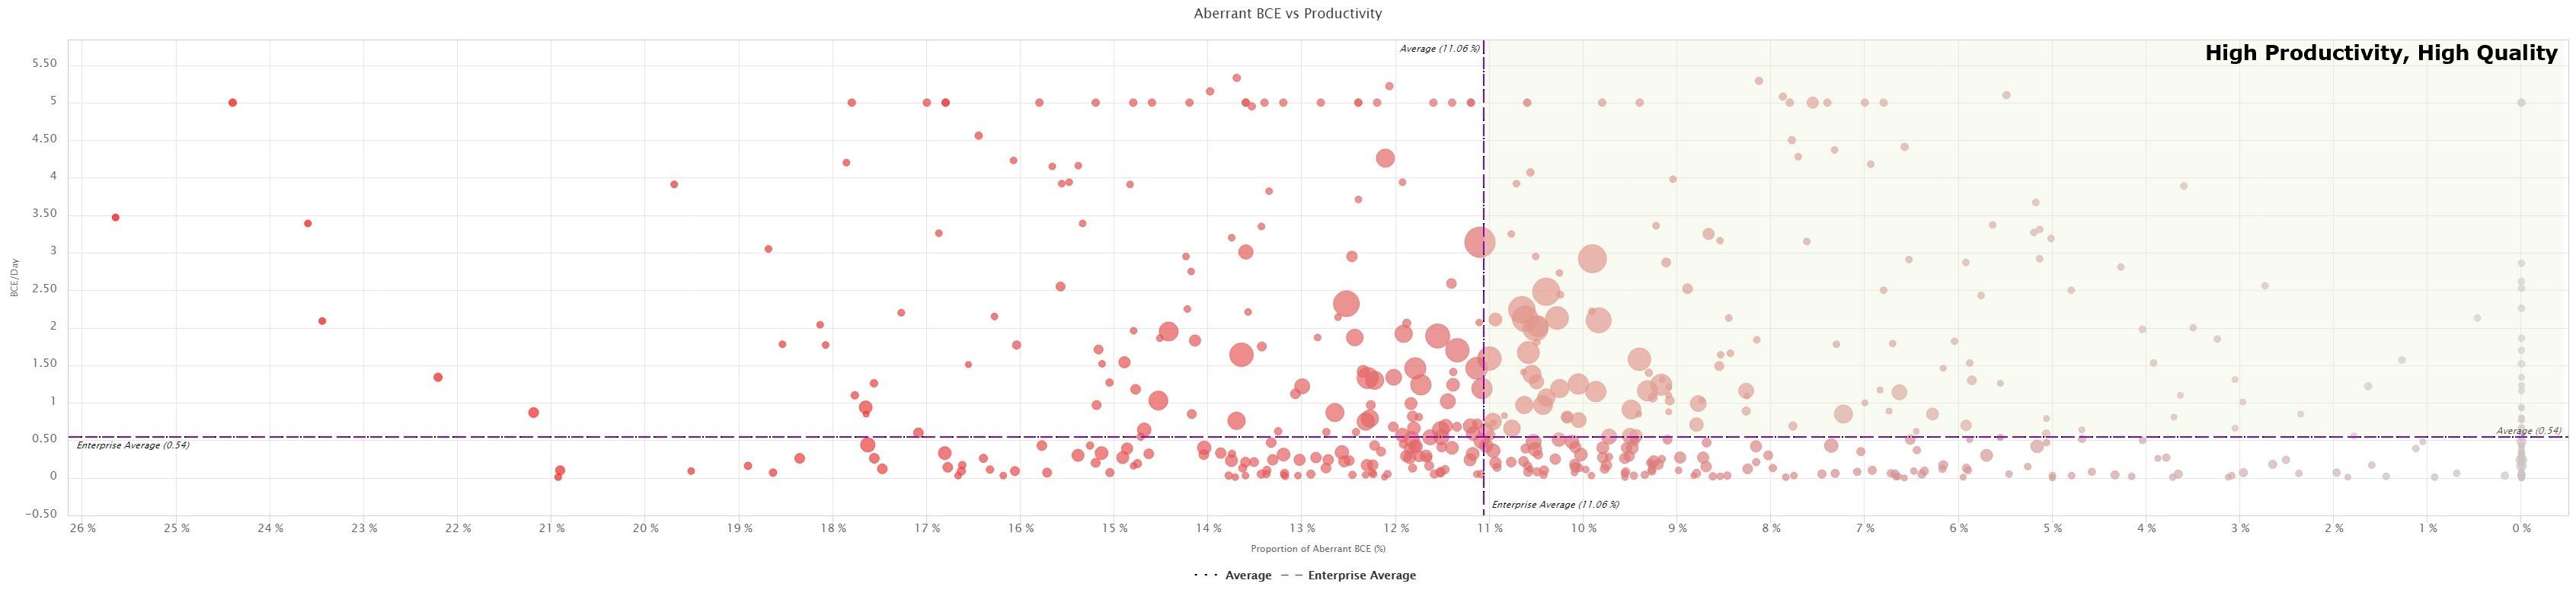 BlueOptima aberrant BCE vs productivity screenshot